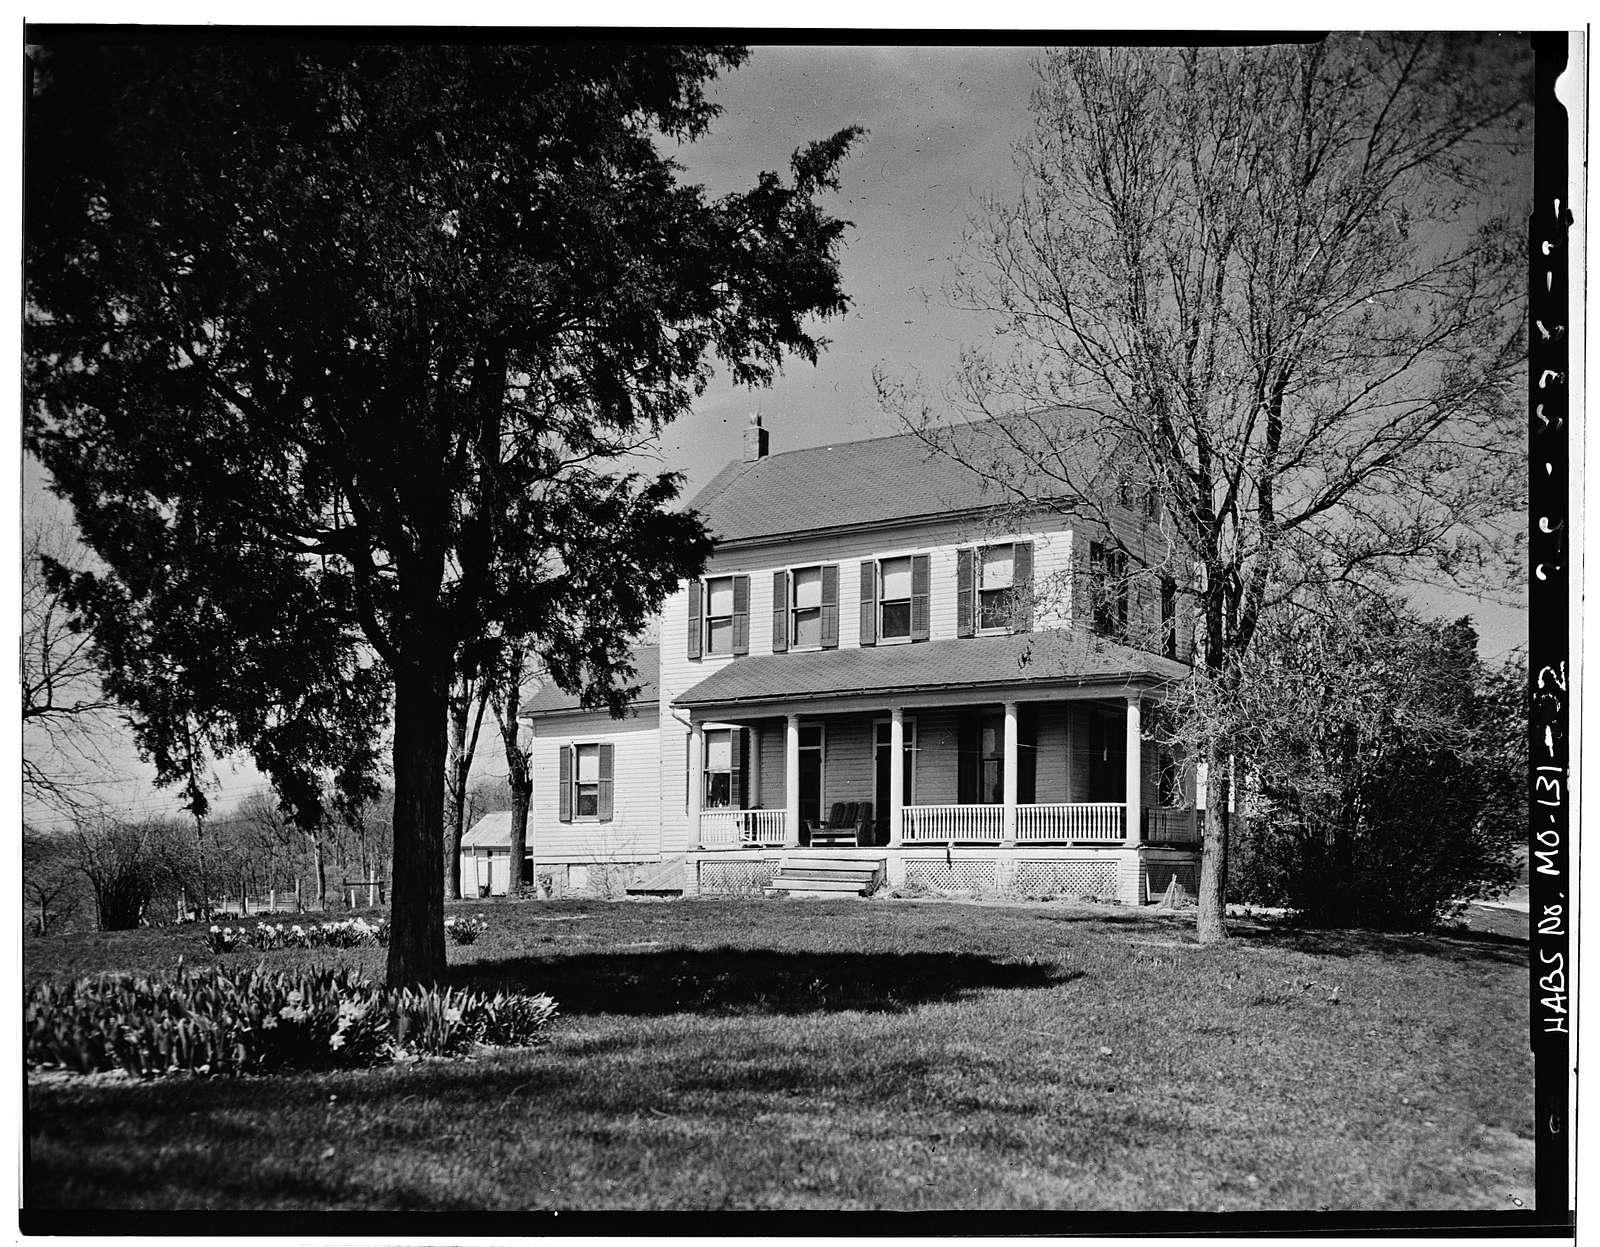 Thornhill, Arrowhead Lane, Chesterfield, St. Louis County, MO